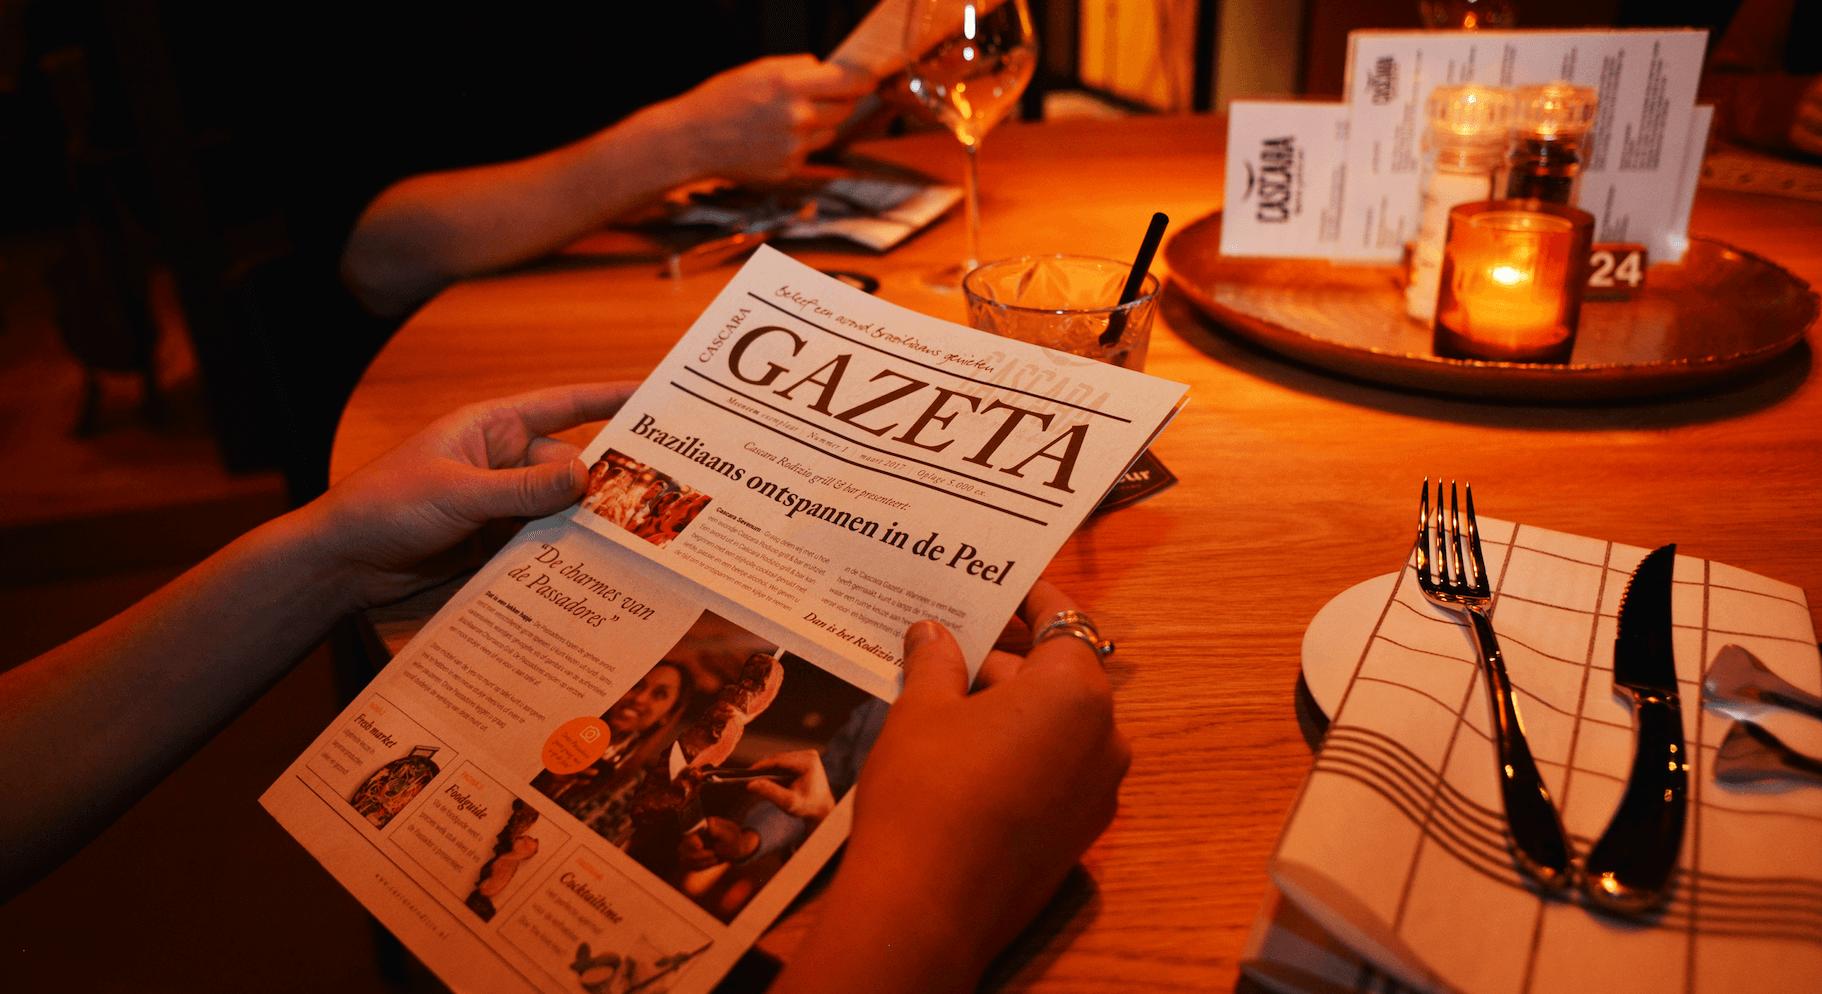 Cascara rodizio gazeta